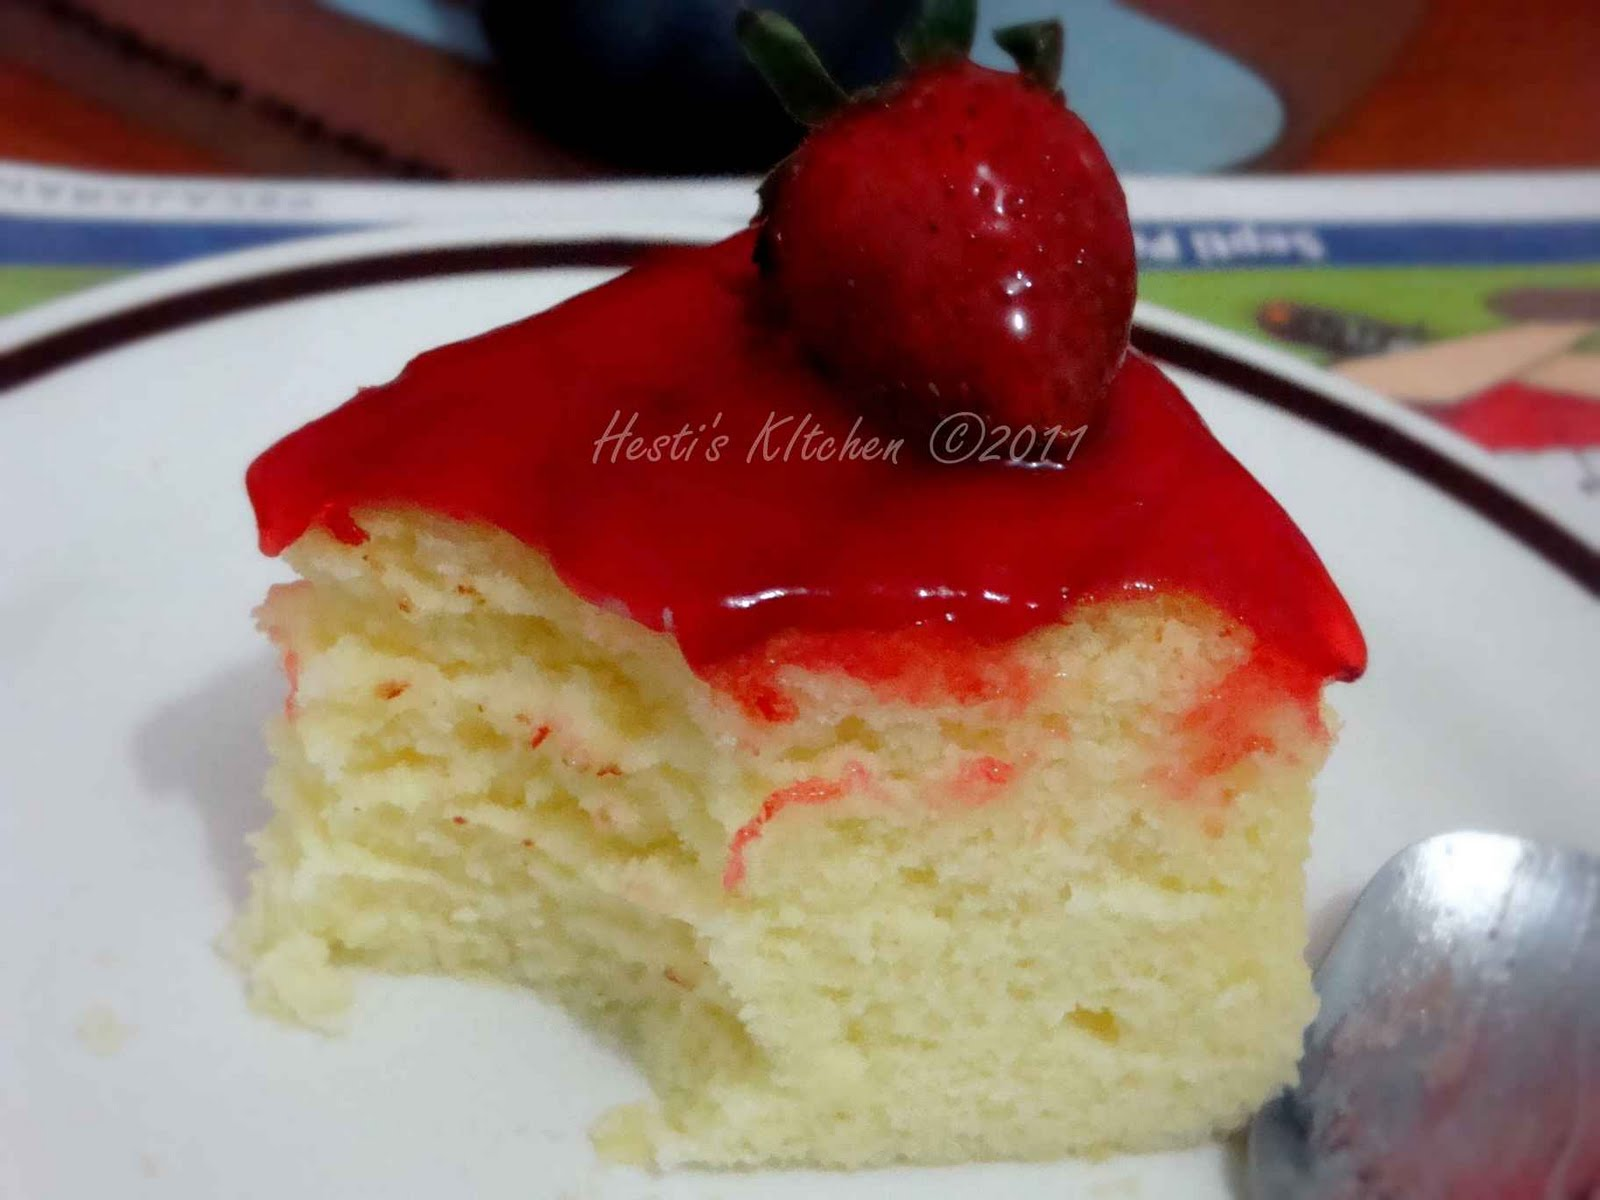 Image Result For Resep Kue Putih Telur Hesti Kitchen